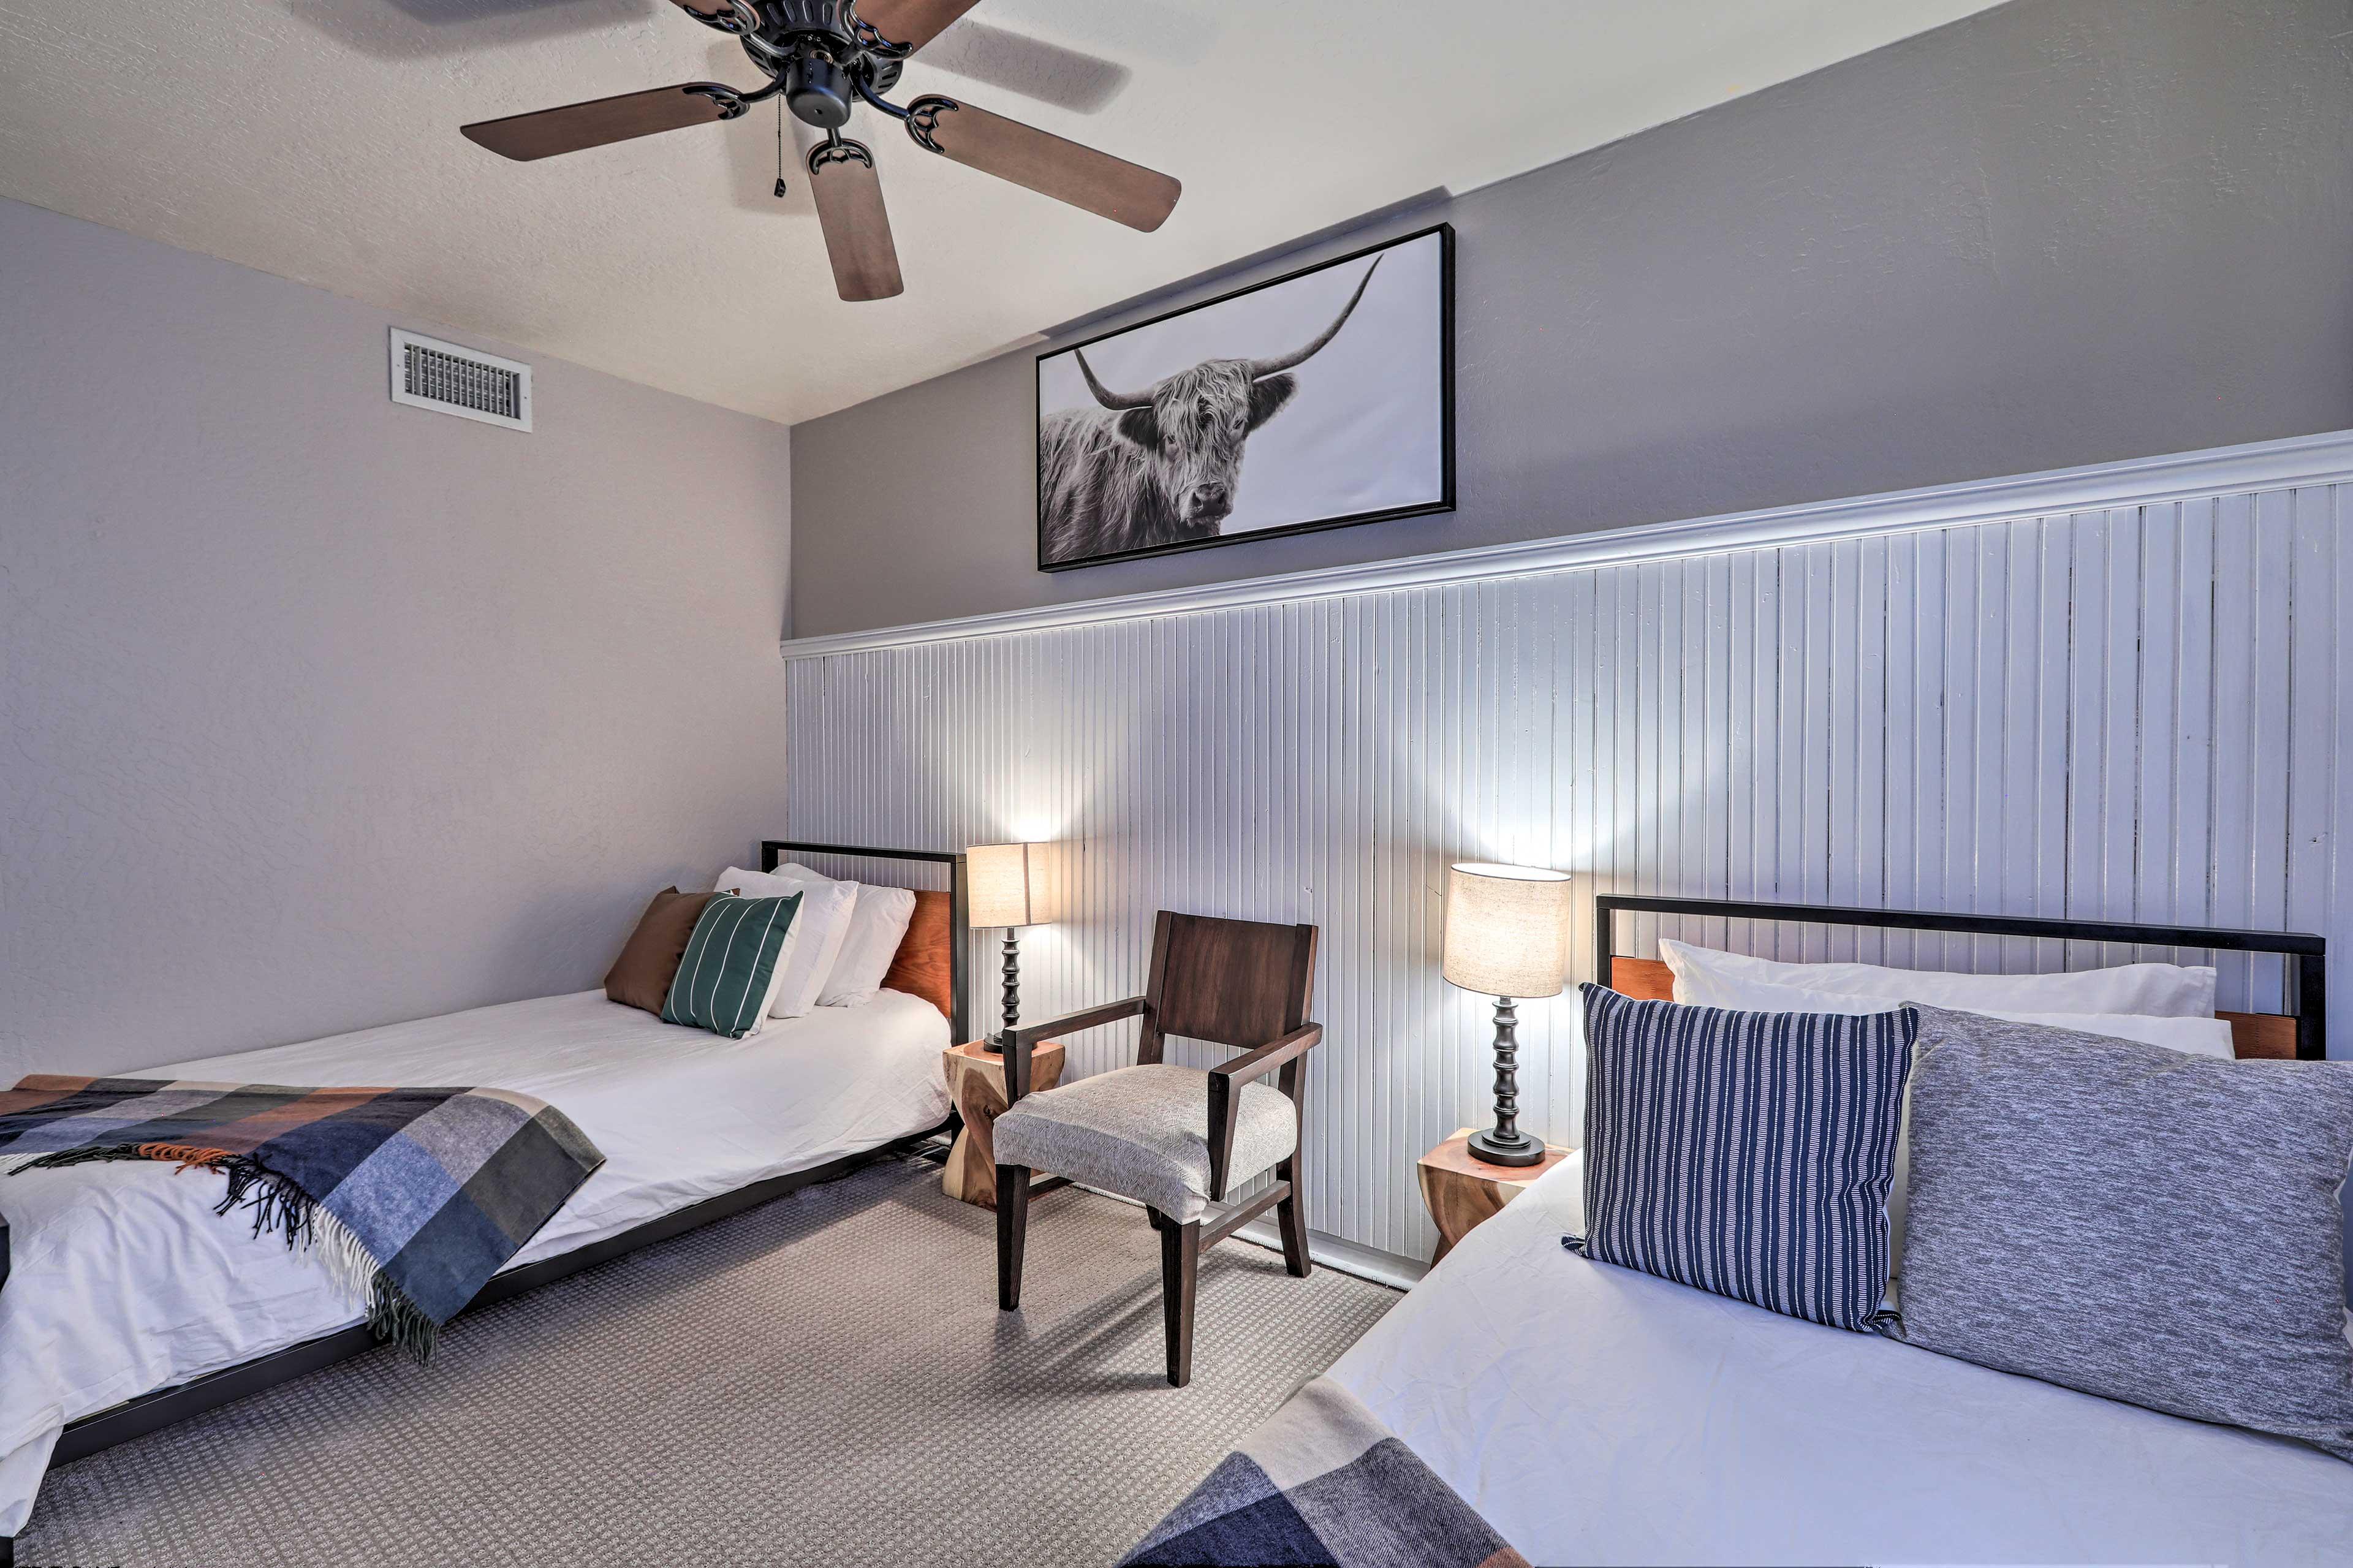 Make yourself comfortable on the fresh sheets.